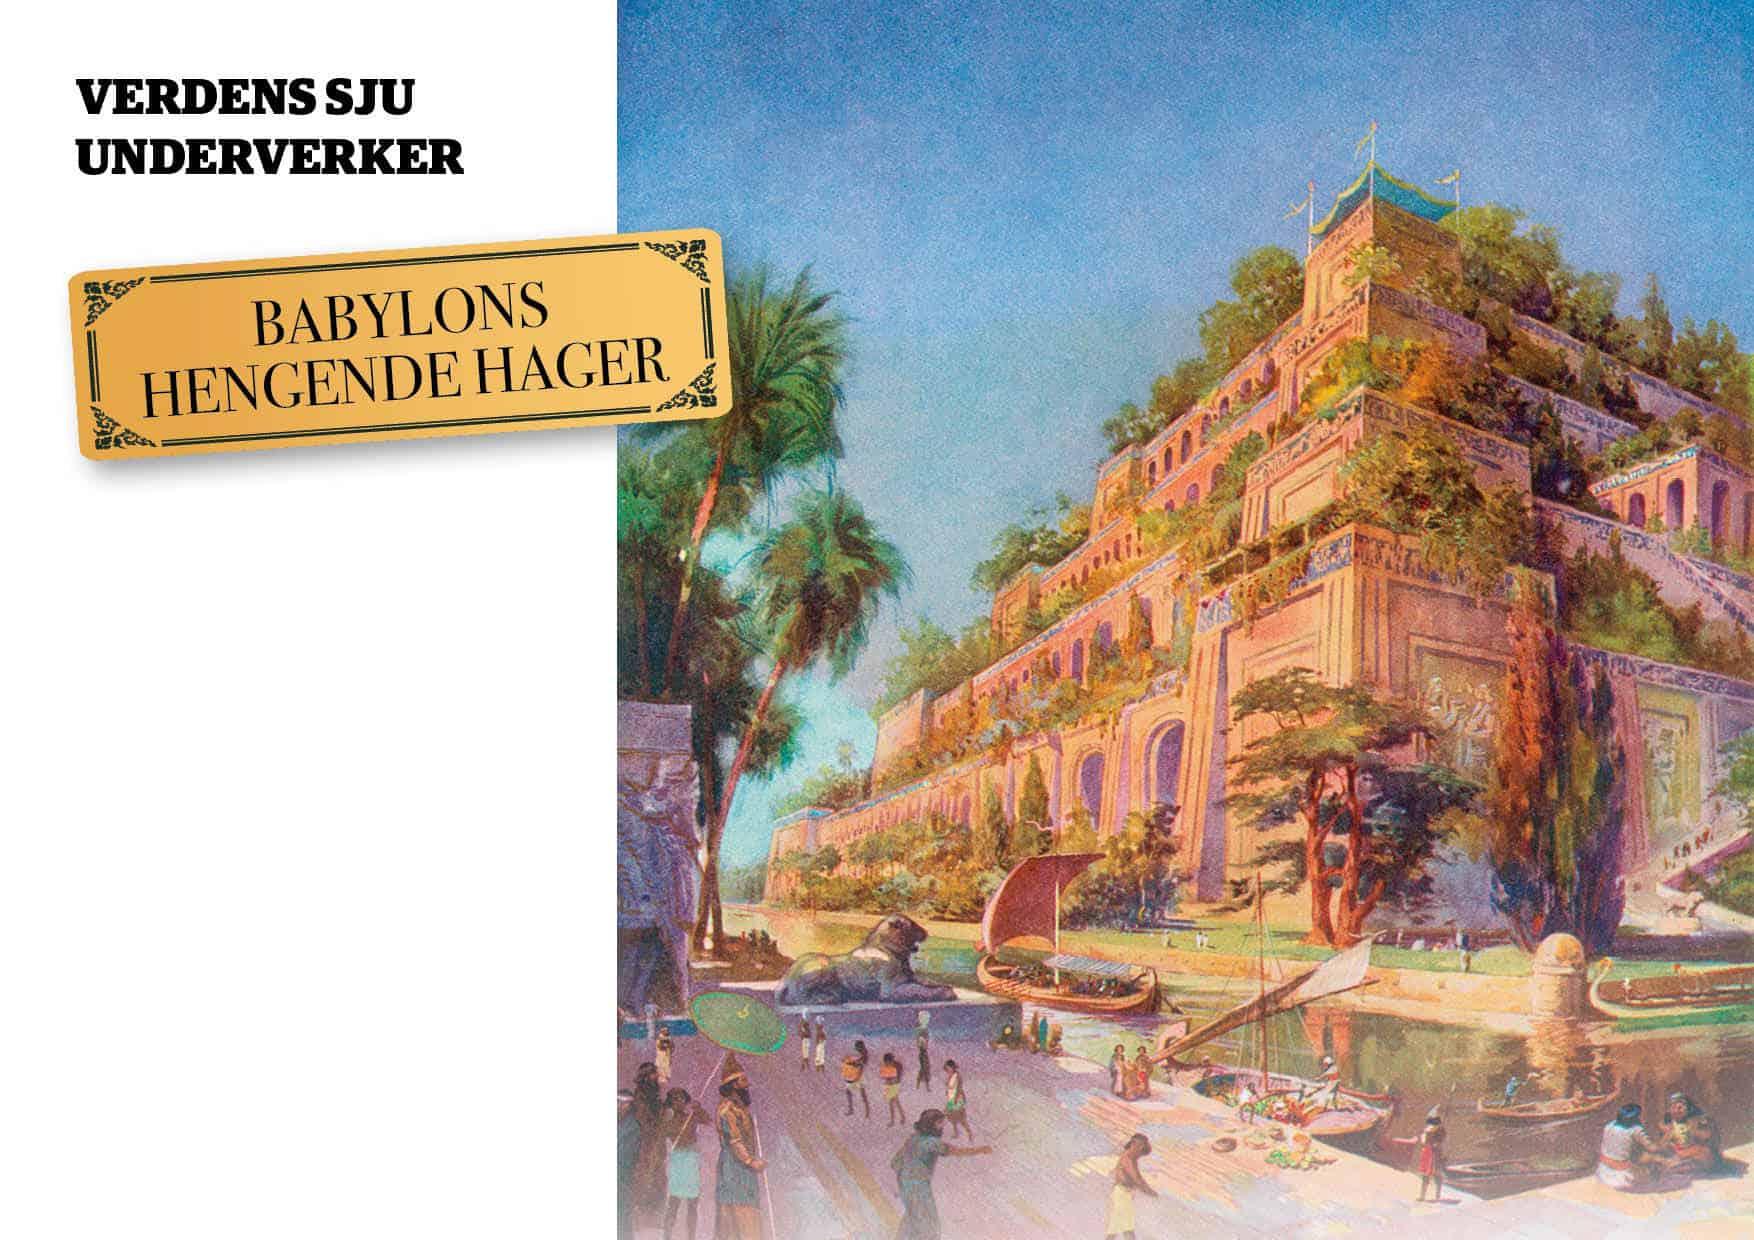 De sju underverker: Babylons hengende hager